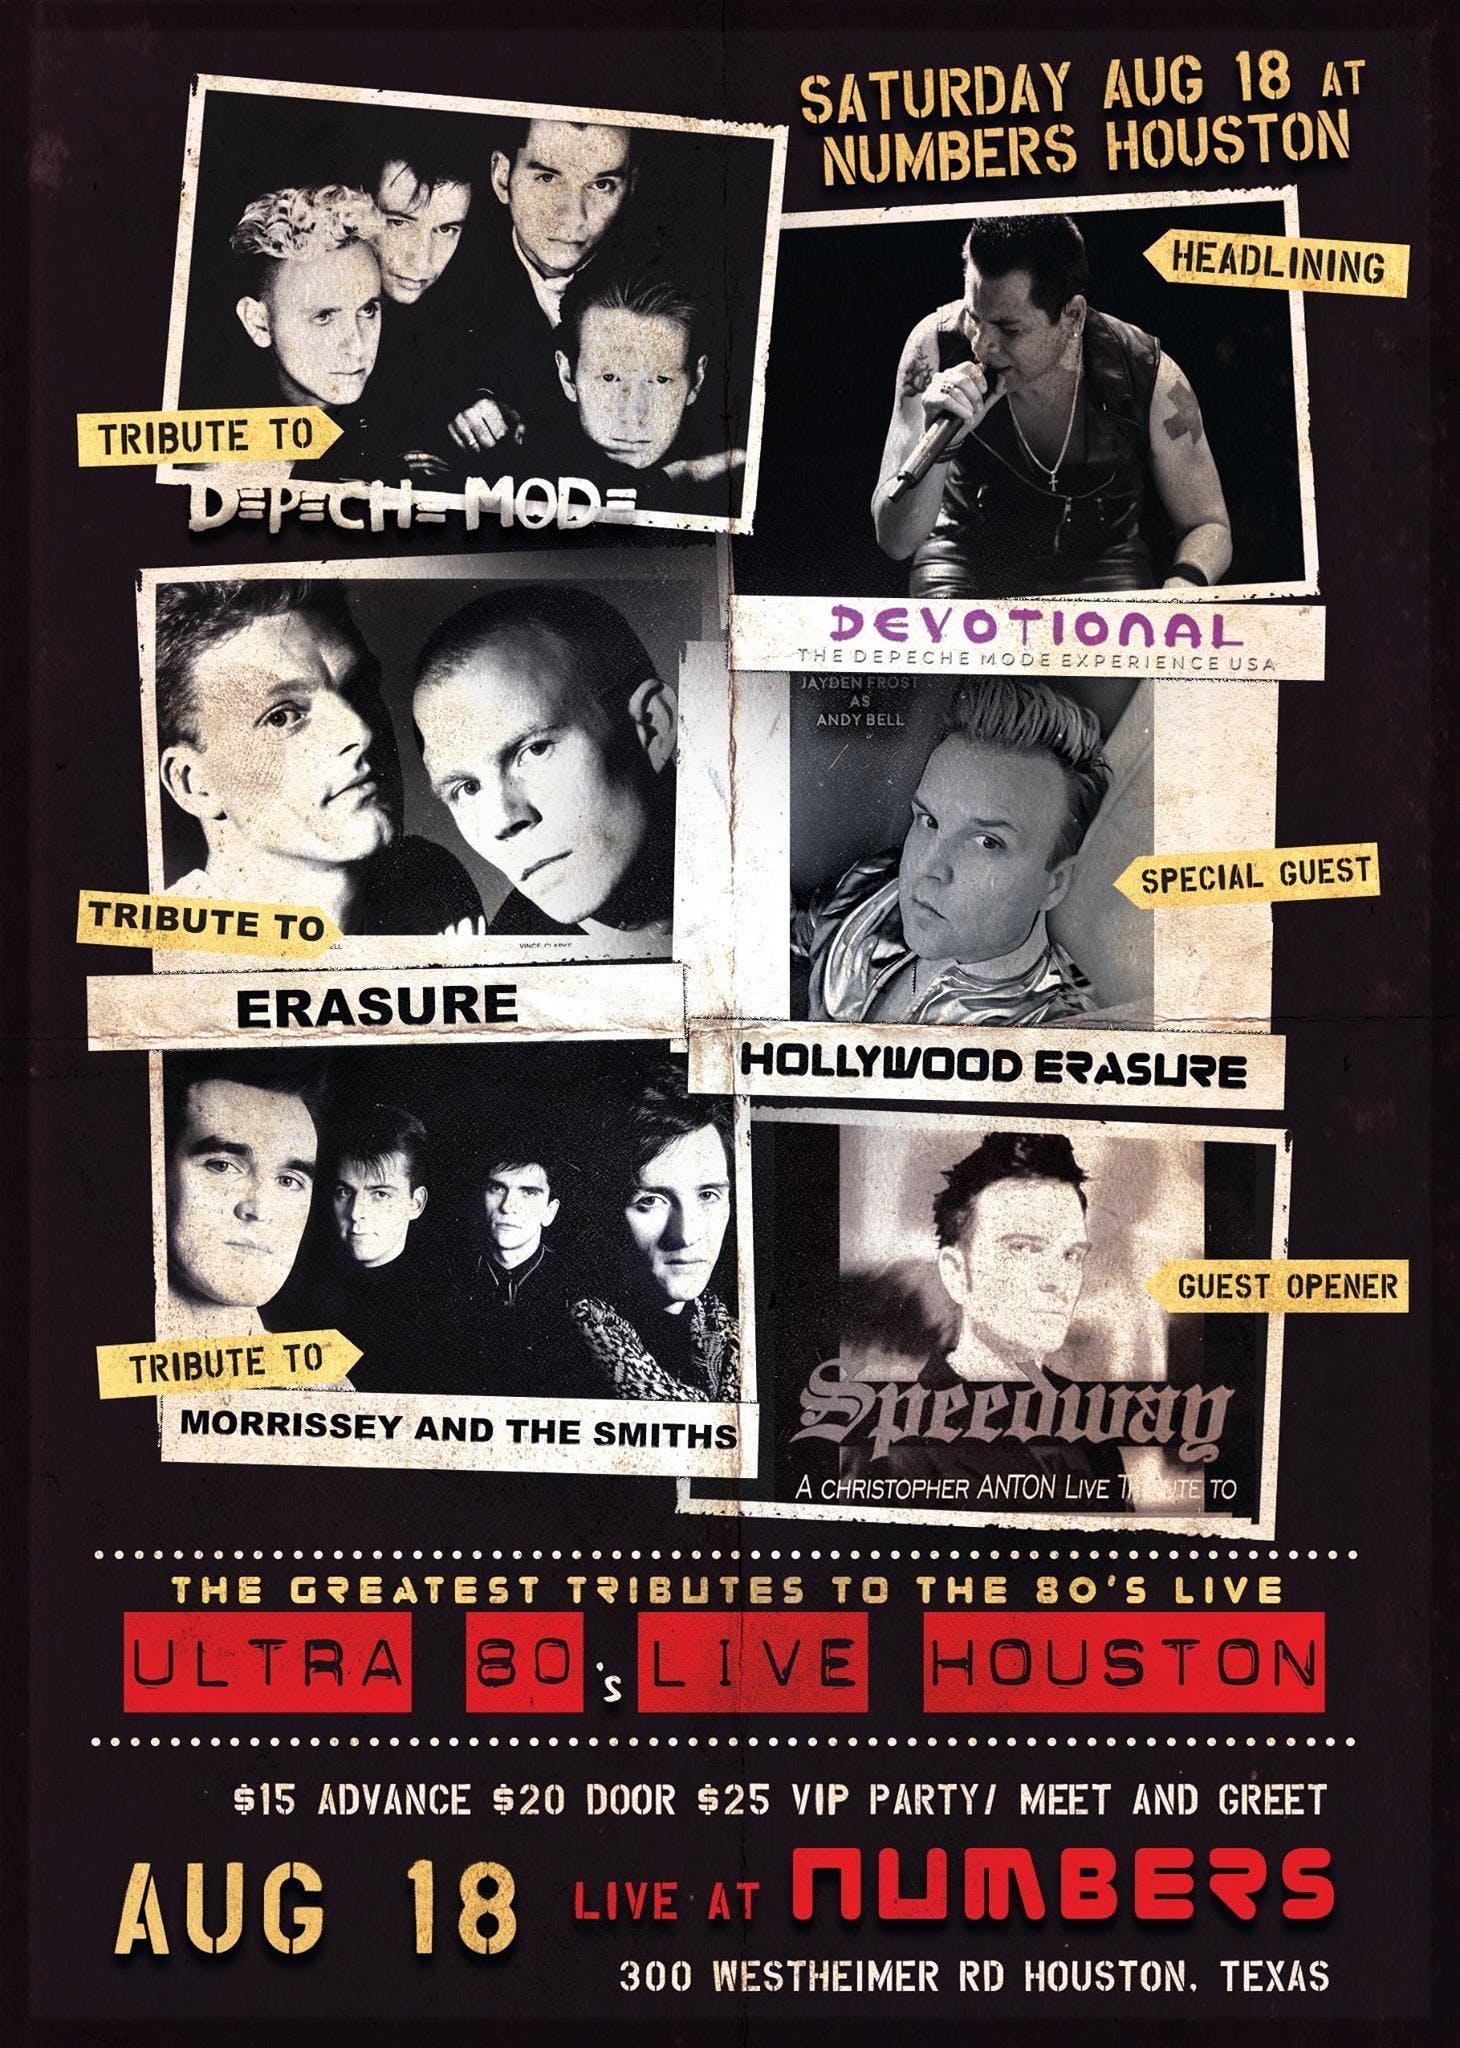 Ultra 80's Tributes to Depeche Mode, Erasure,